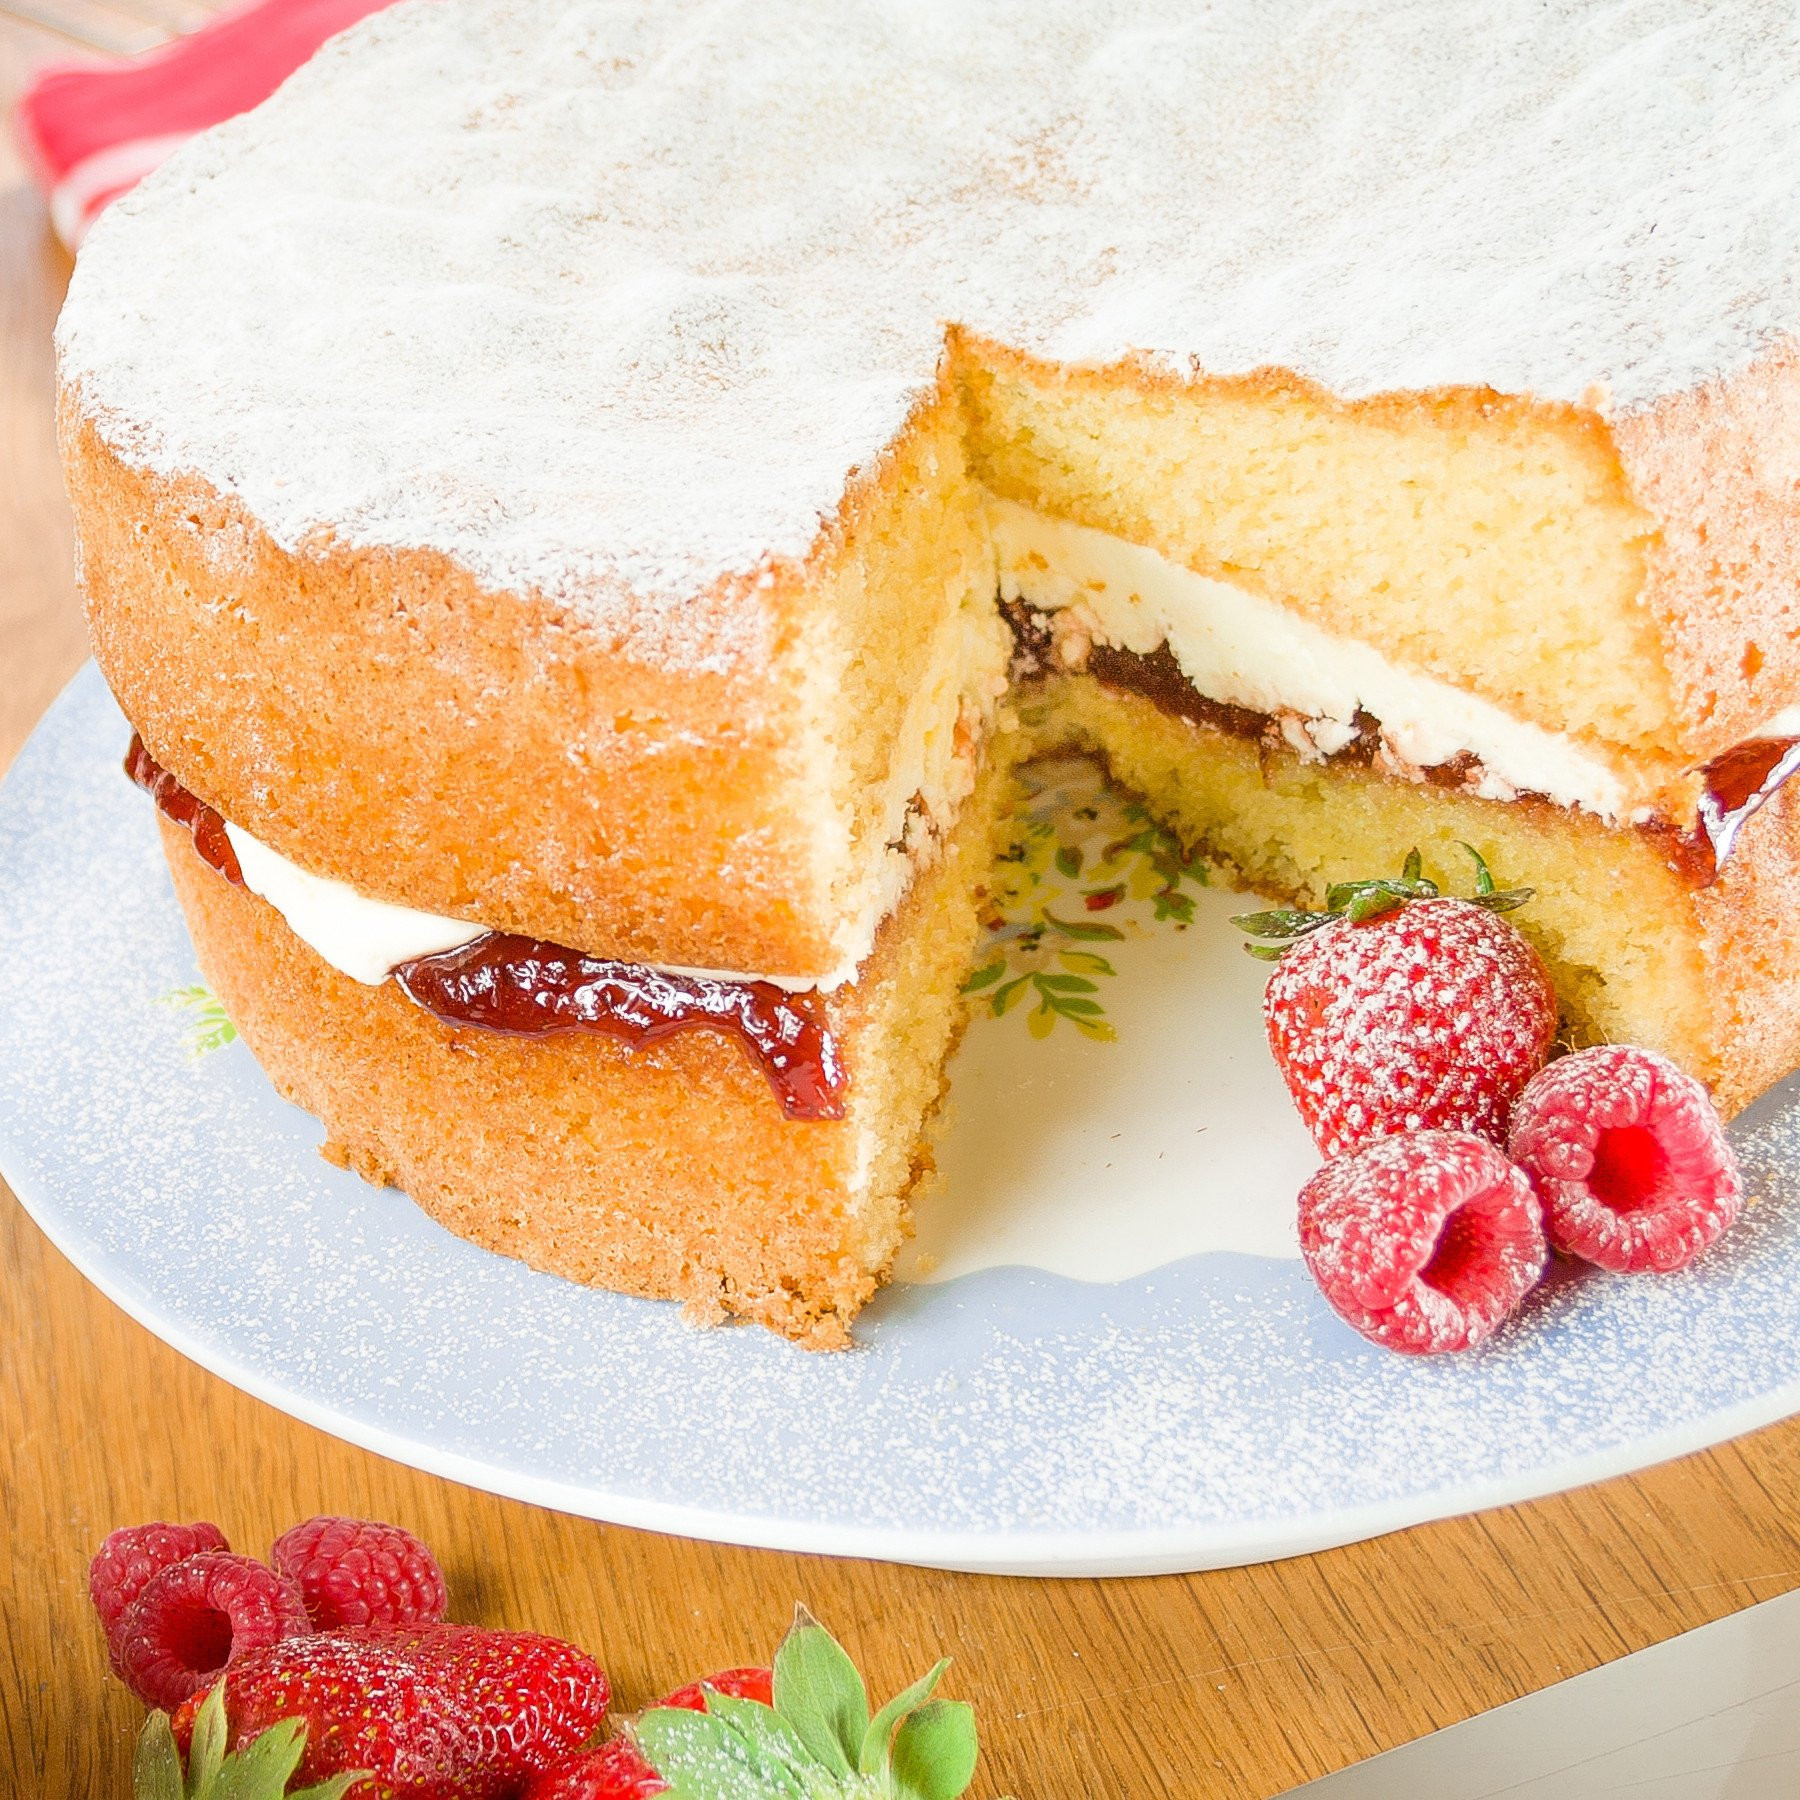 Sponge Cake Recipe  Classic Victoria Sponge Cake Recipe — the definitive 9